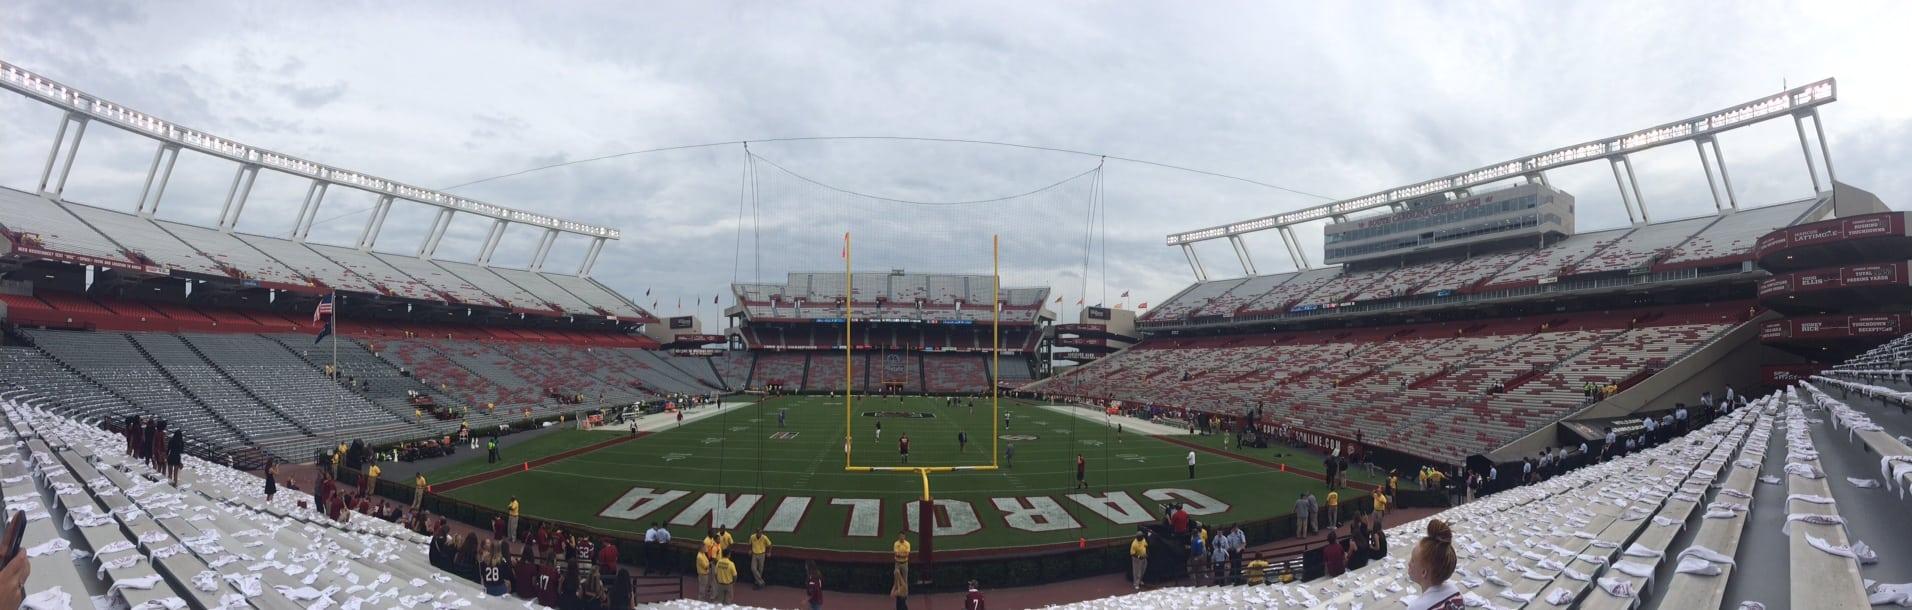 game day at the University of South Carolina Williams Brice Stadium